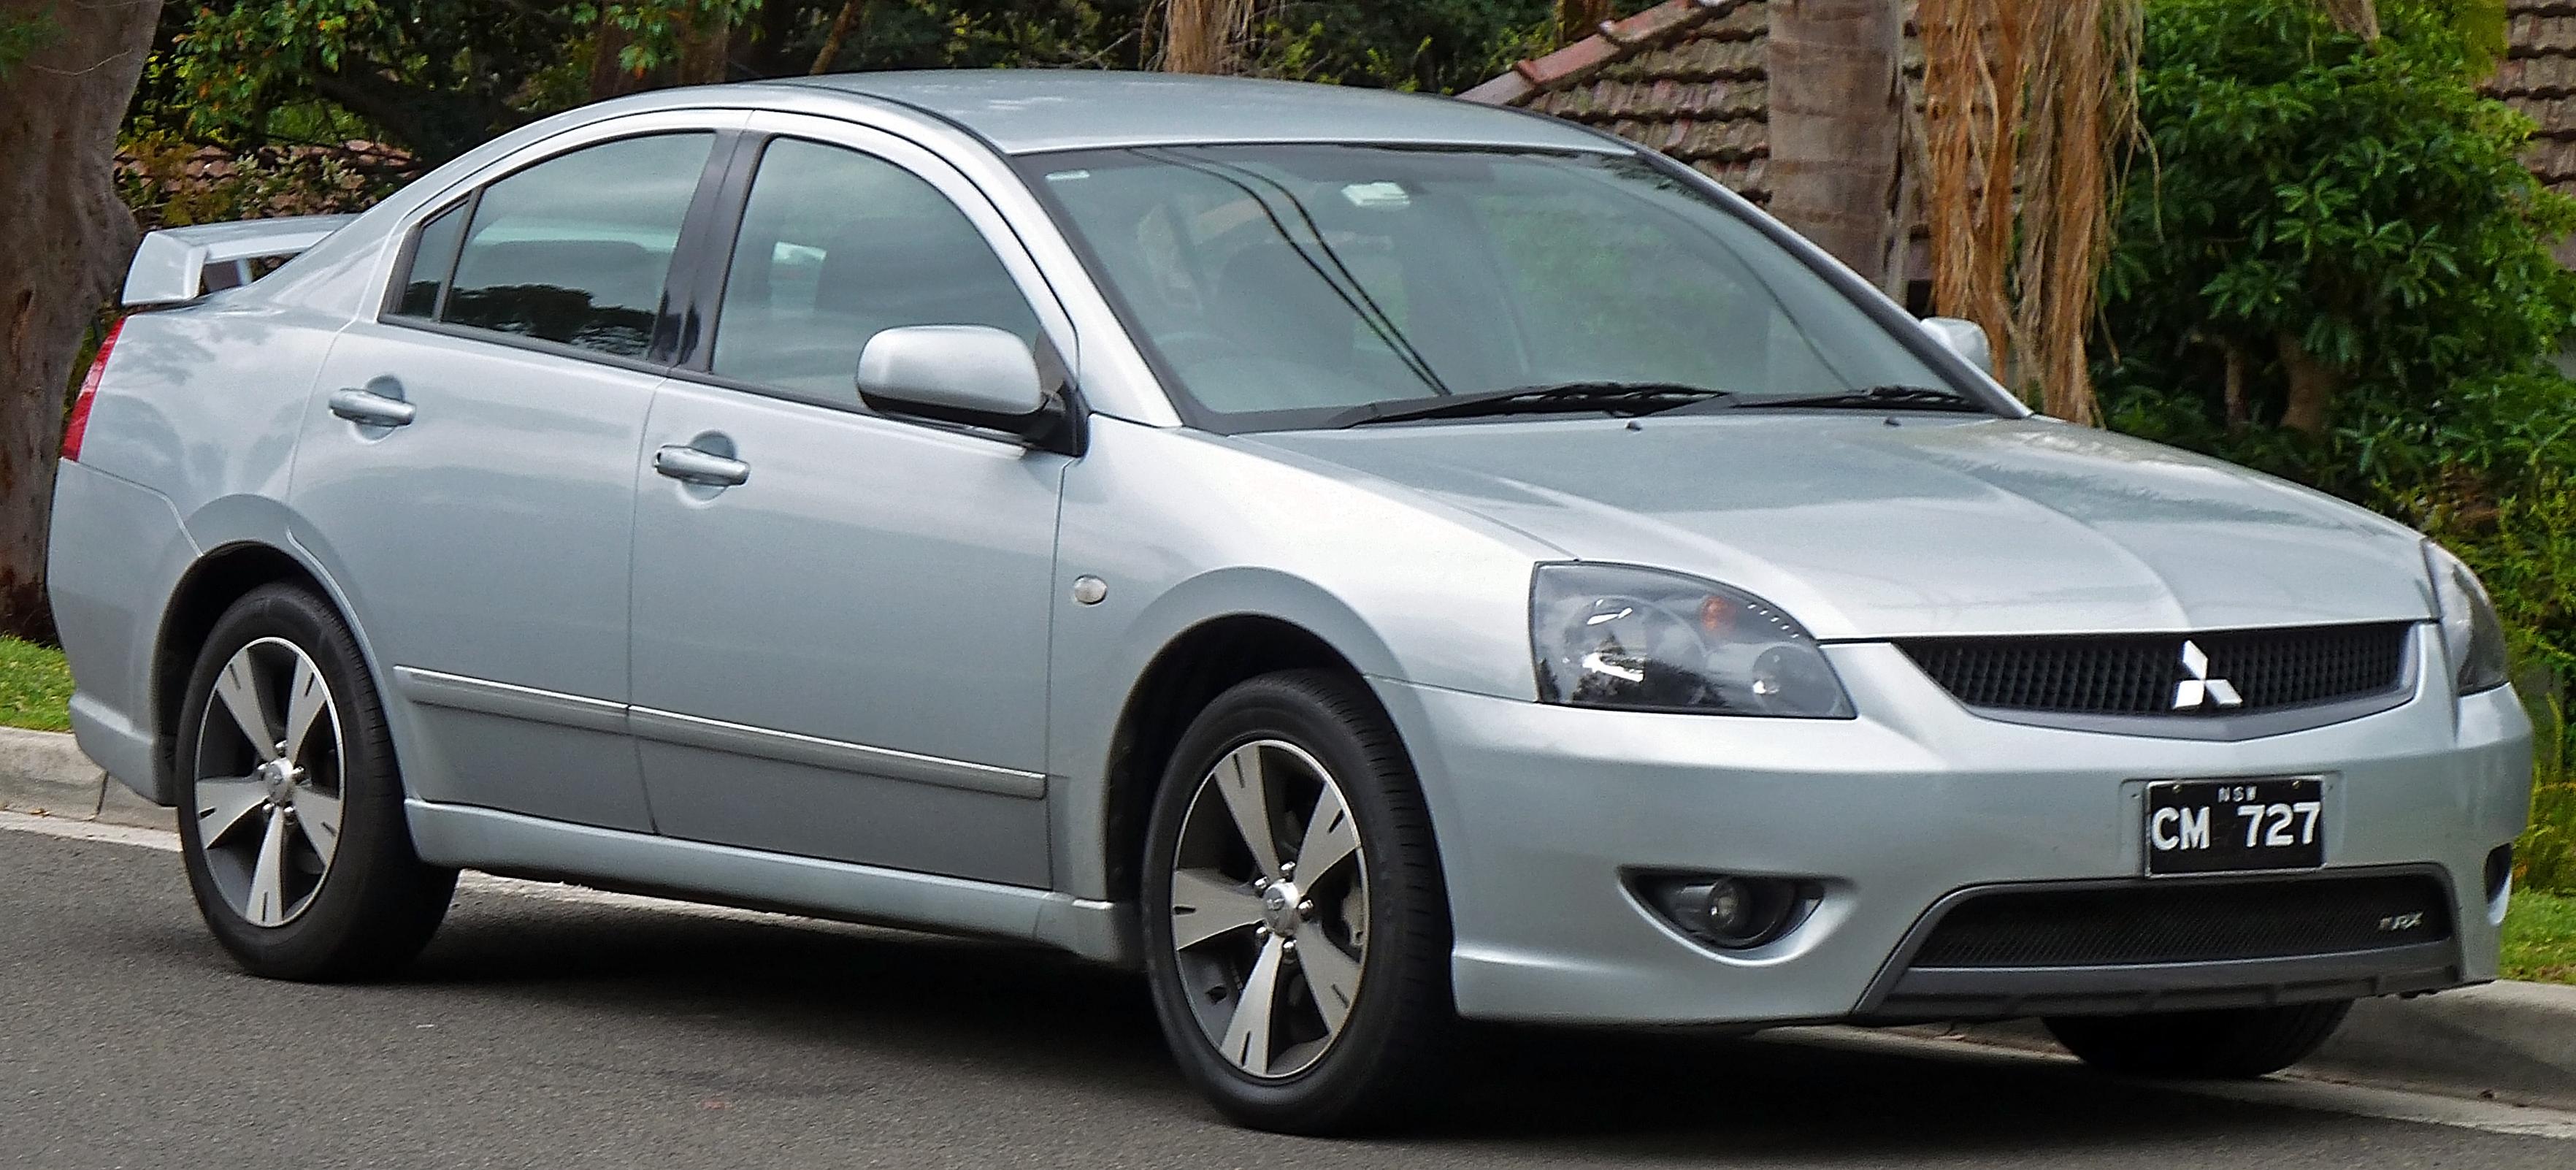 2007-2008_Mitsubishi_380_(DB_III)_VR-X_sedan_01 Radio Wiring Diagram Chevy Tahoe on 2 door accessories, straight axle, 4 door fuel system diagram,